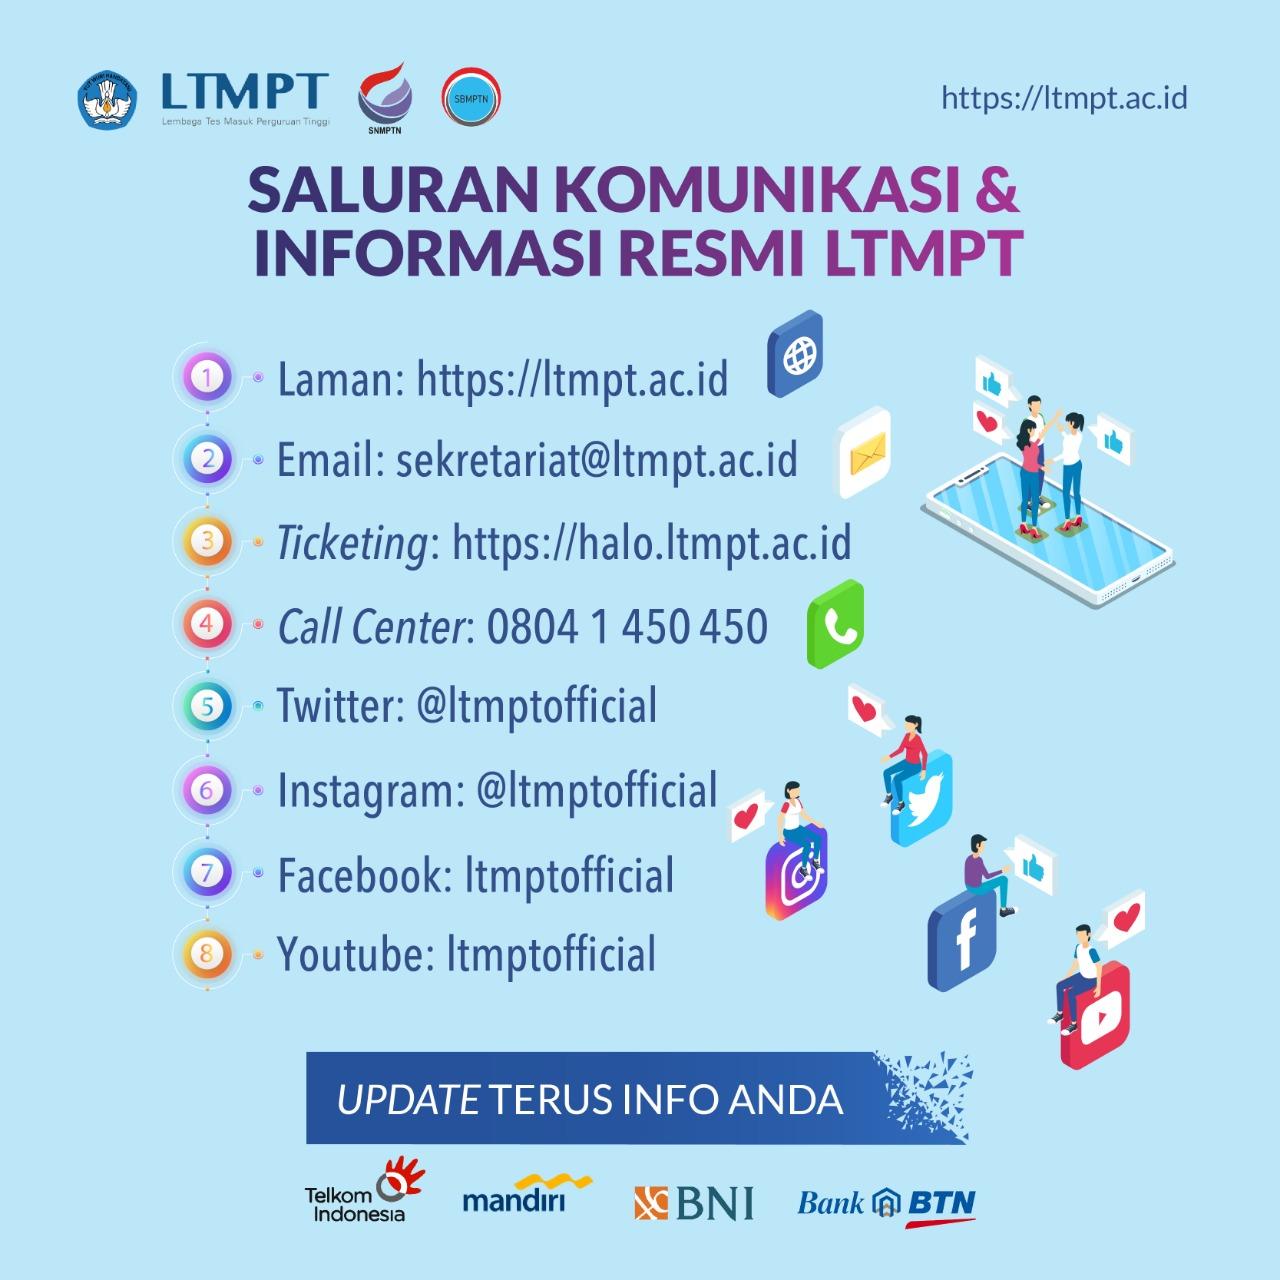 Cara Pendaftaran Online Akun Ltmpt Utbk Sbmptn 2021 2022 Pendaftaran Net 2021 2022